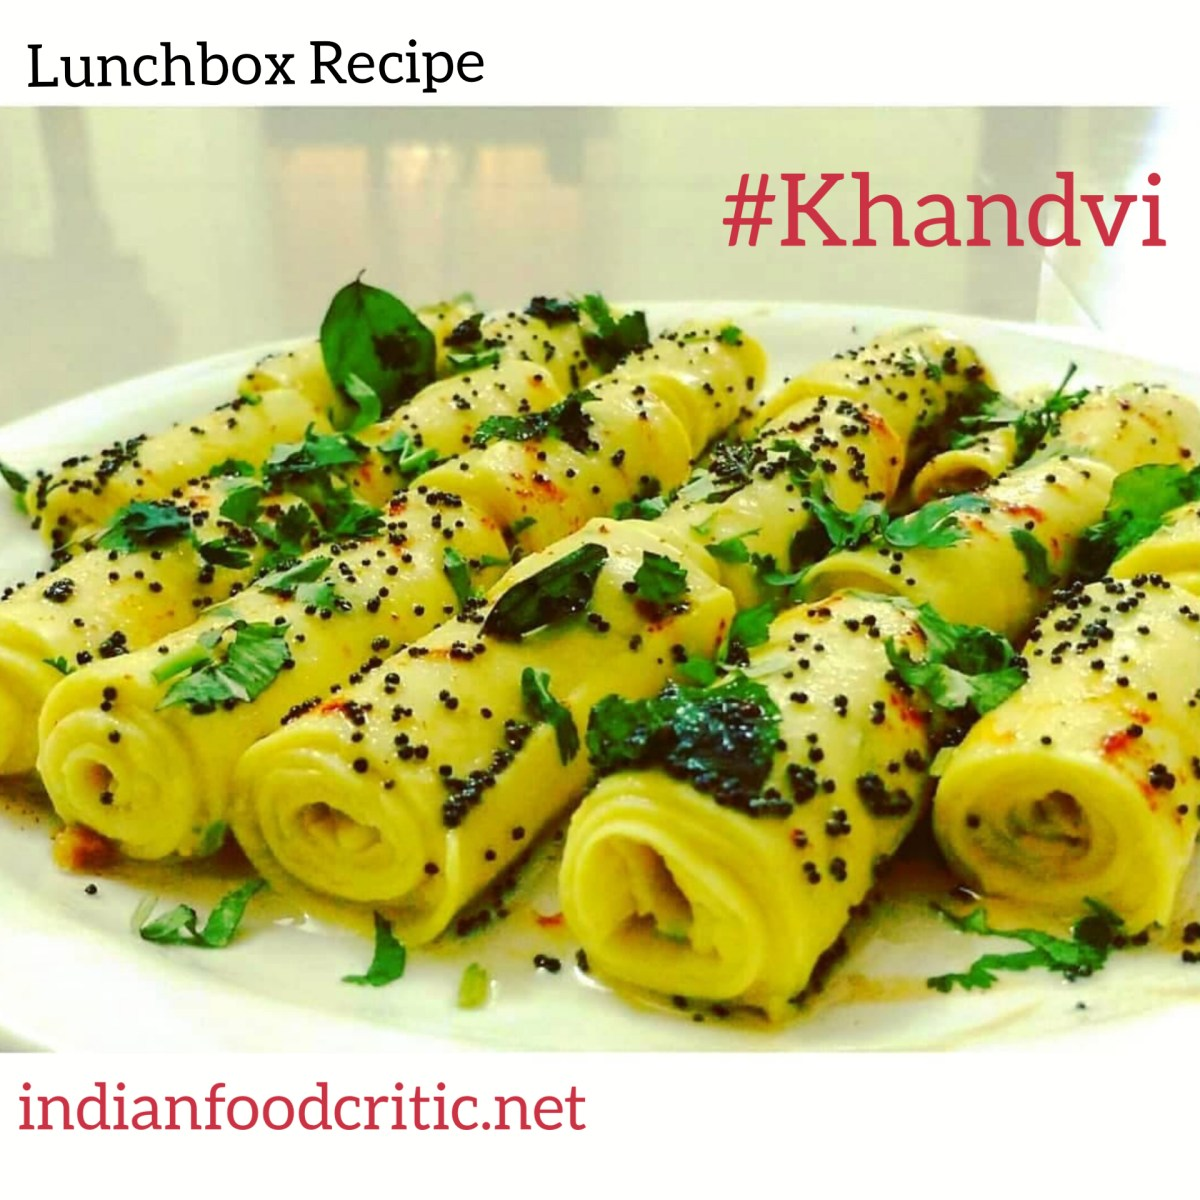 How to make soft melt in the mouth Gujrati Khandvi? | 8 new Stuffed Khandvi Recipes! | Gujrati Food - Pressure Cooker & Microwave Preparation | 4.75/5.0